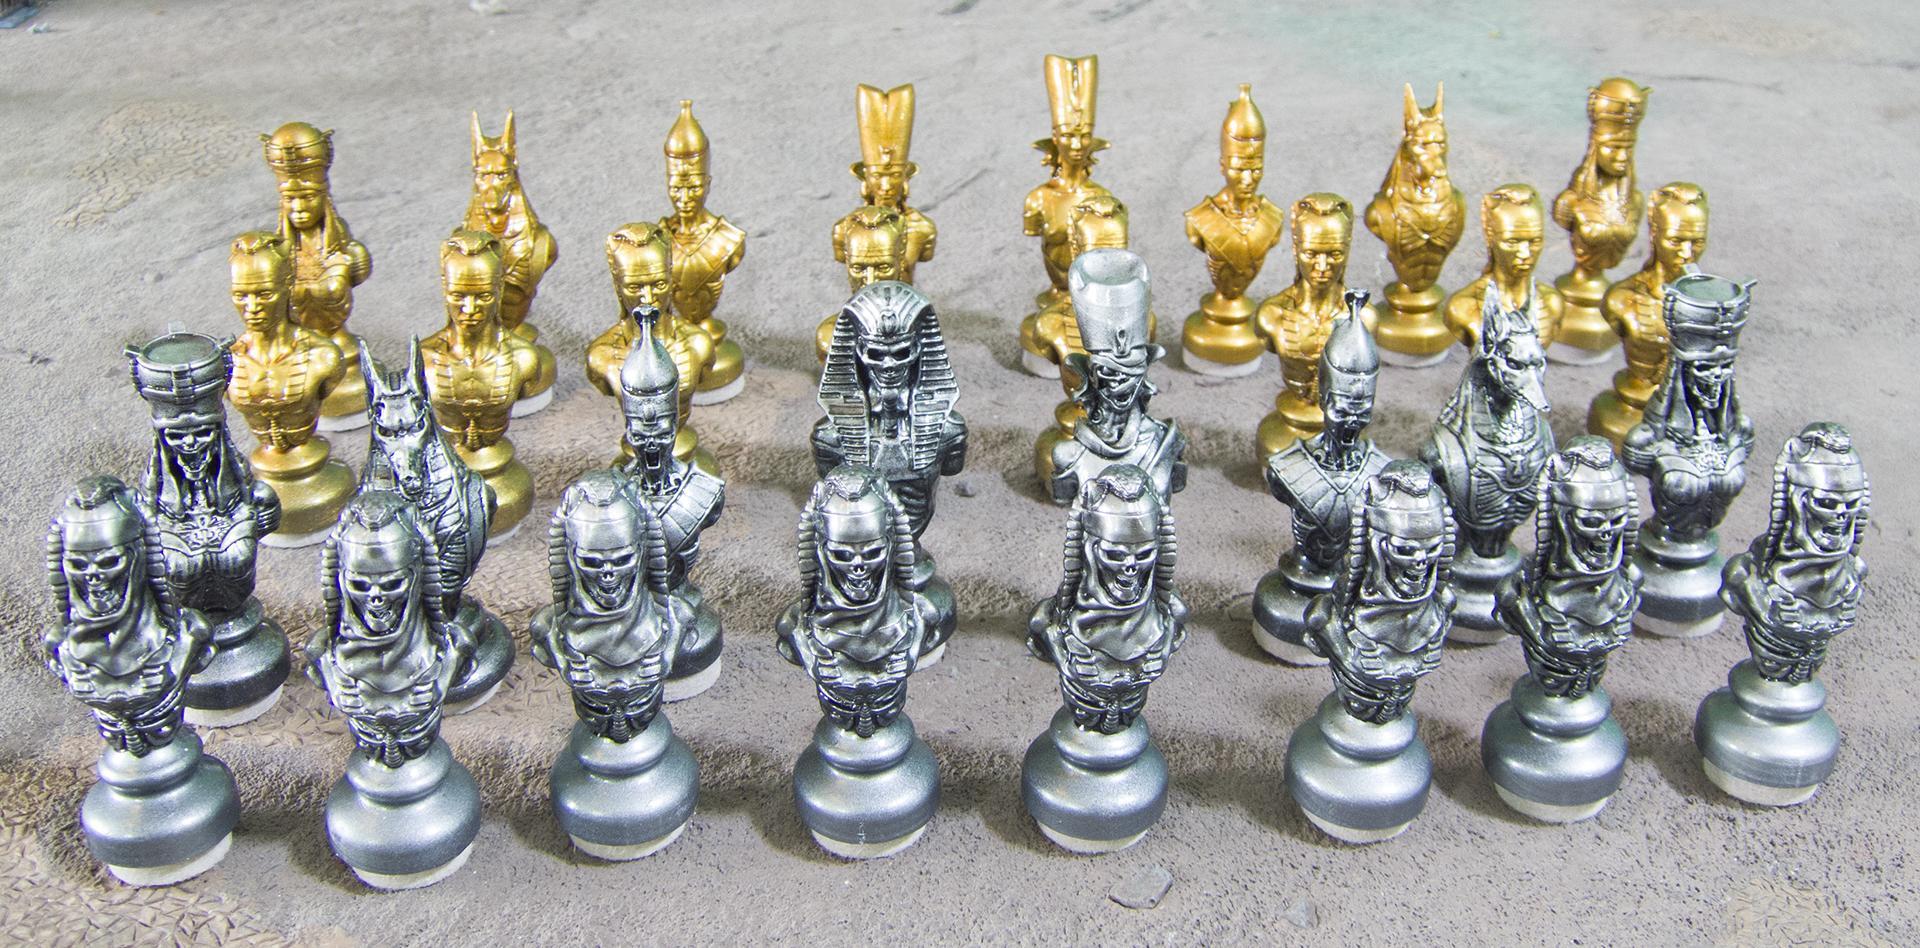 3d Print, 3d Printing, Anycubic Photon, Chess, Egyptian, Photon